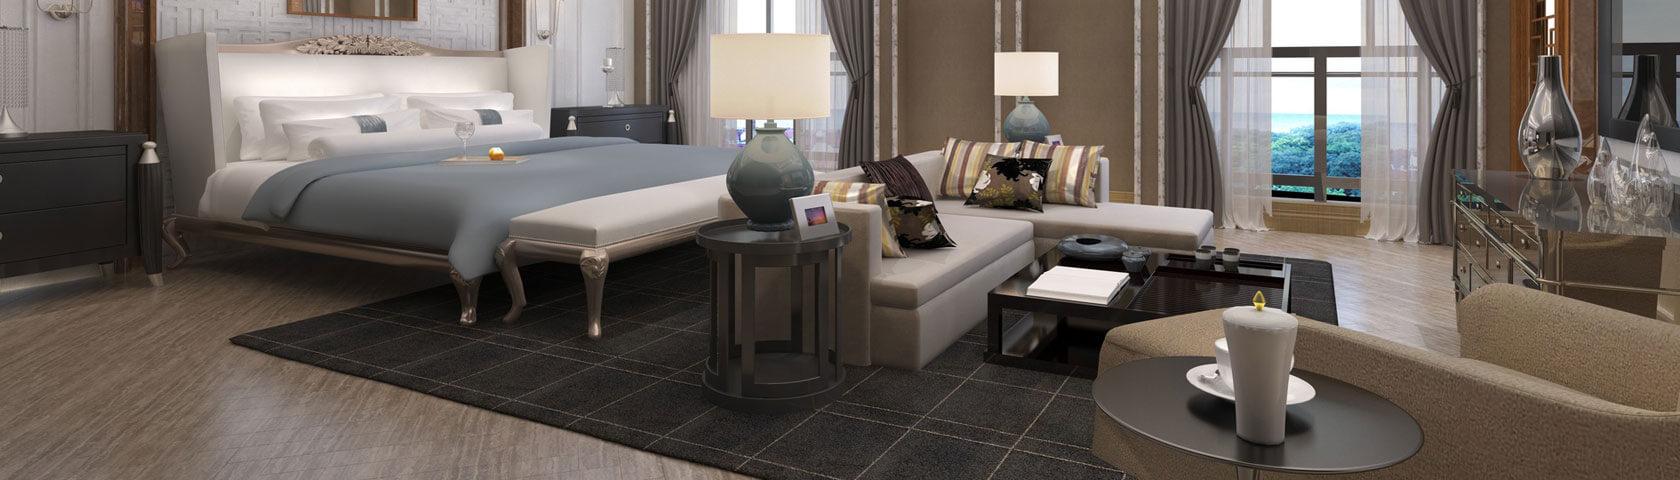 Luxurious Modern Bedroom Setup